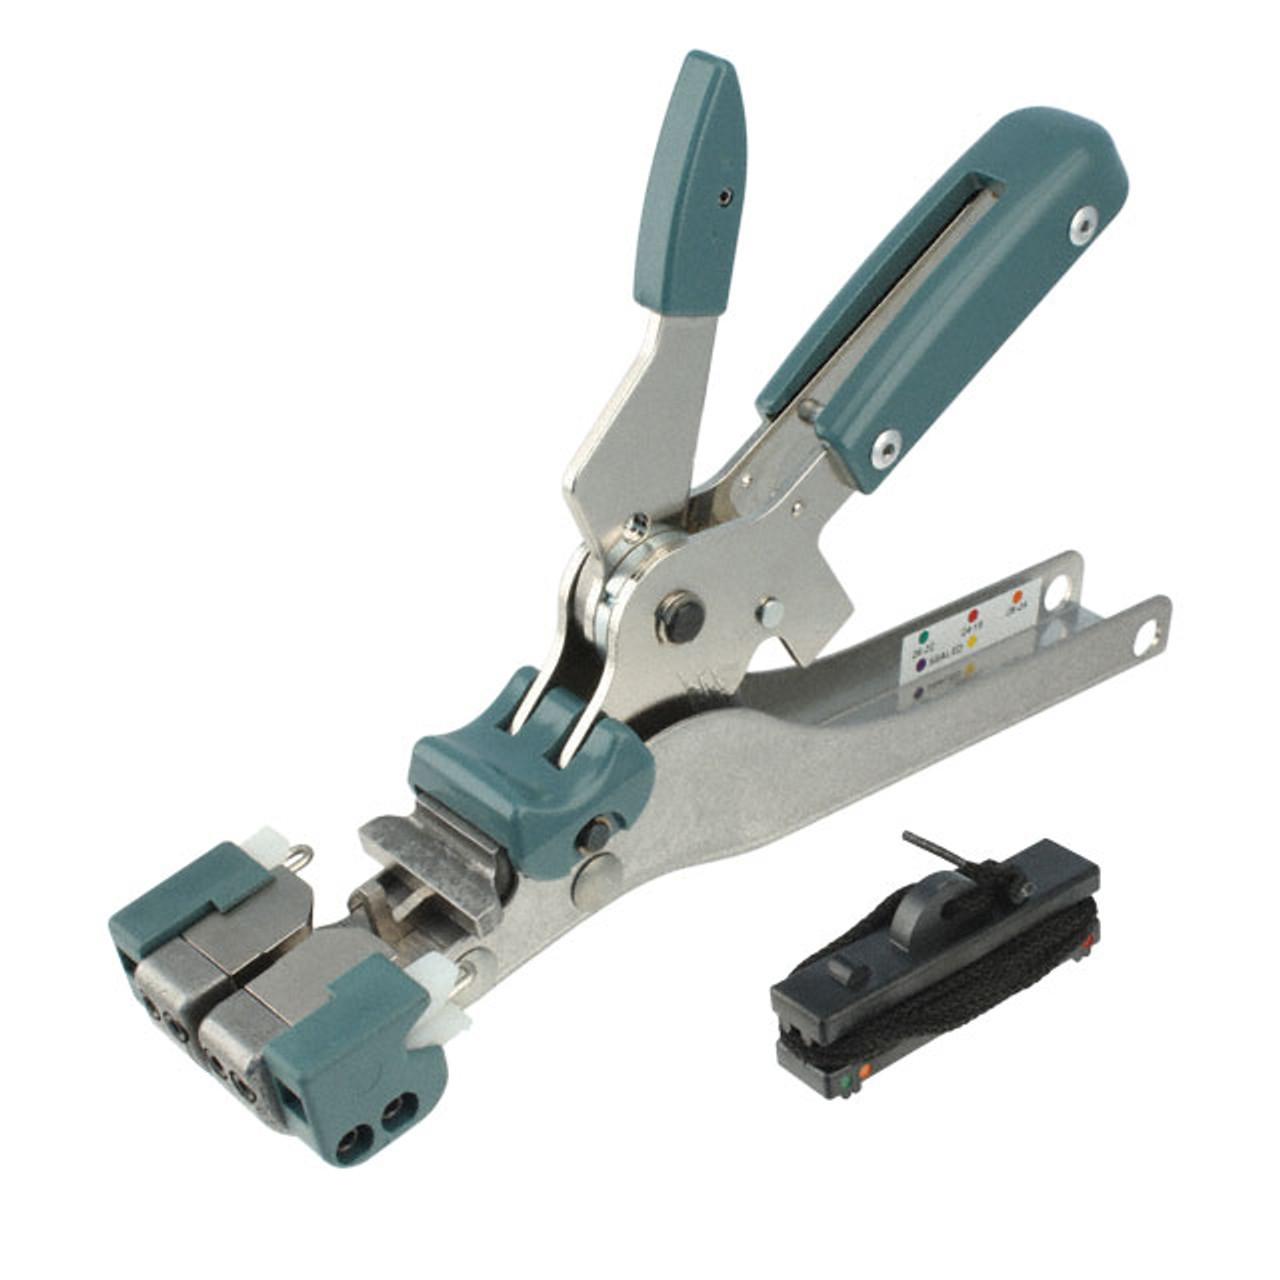 244271-6 Amp Tyco Electronics VS-BA Picabond Crimp Tool